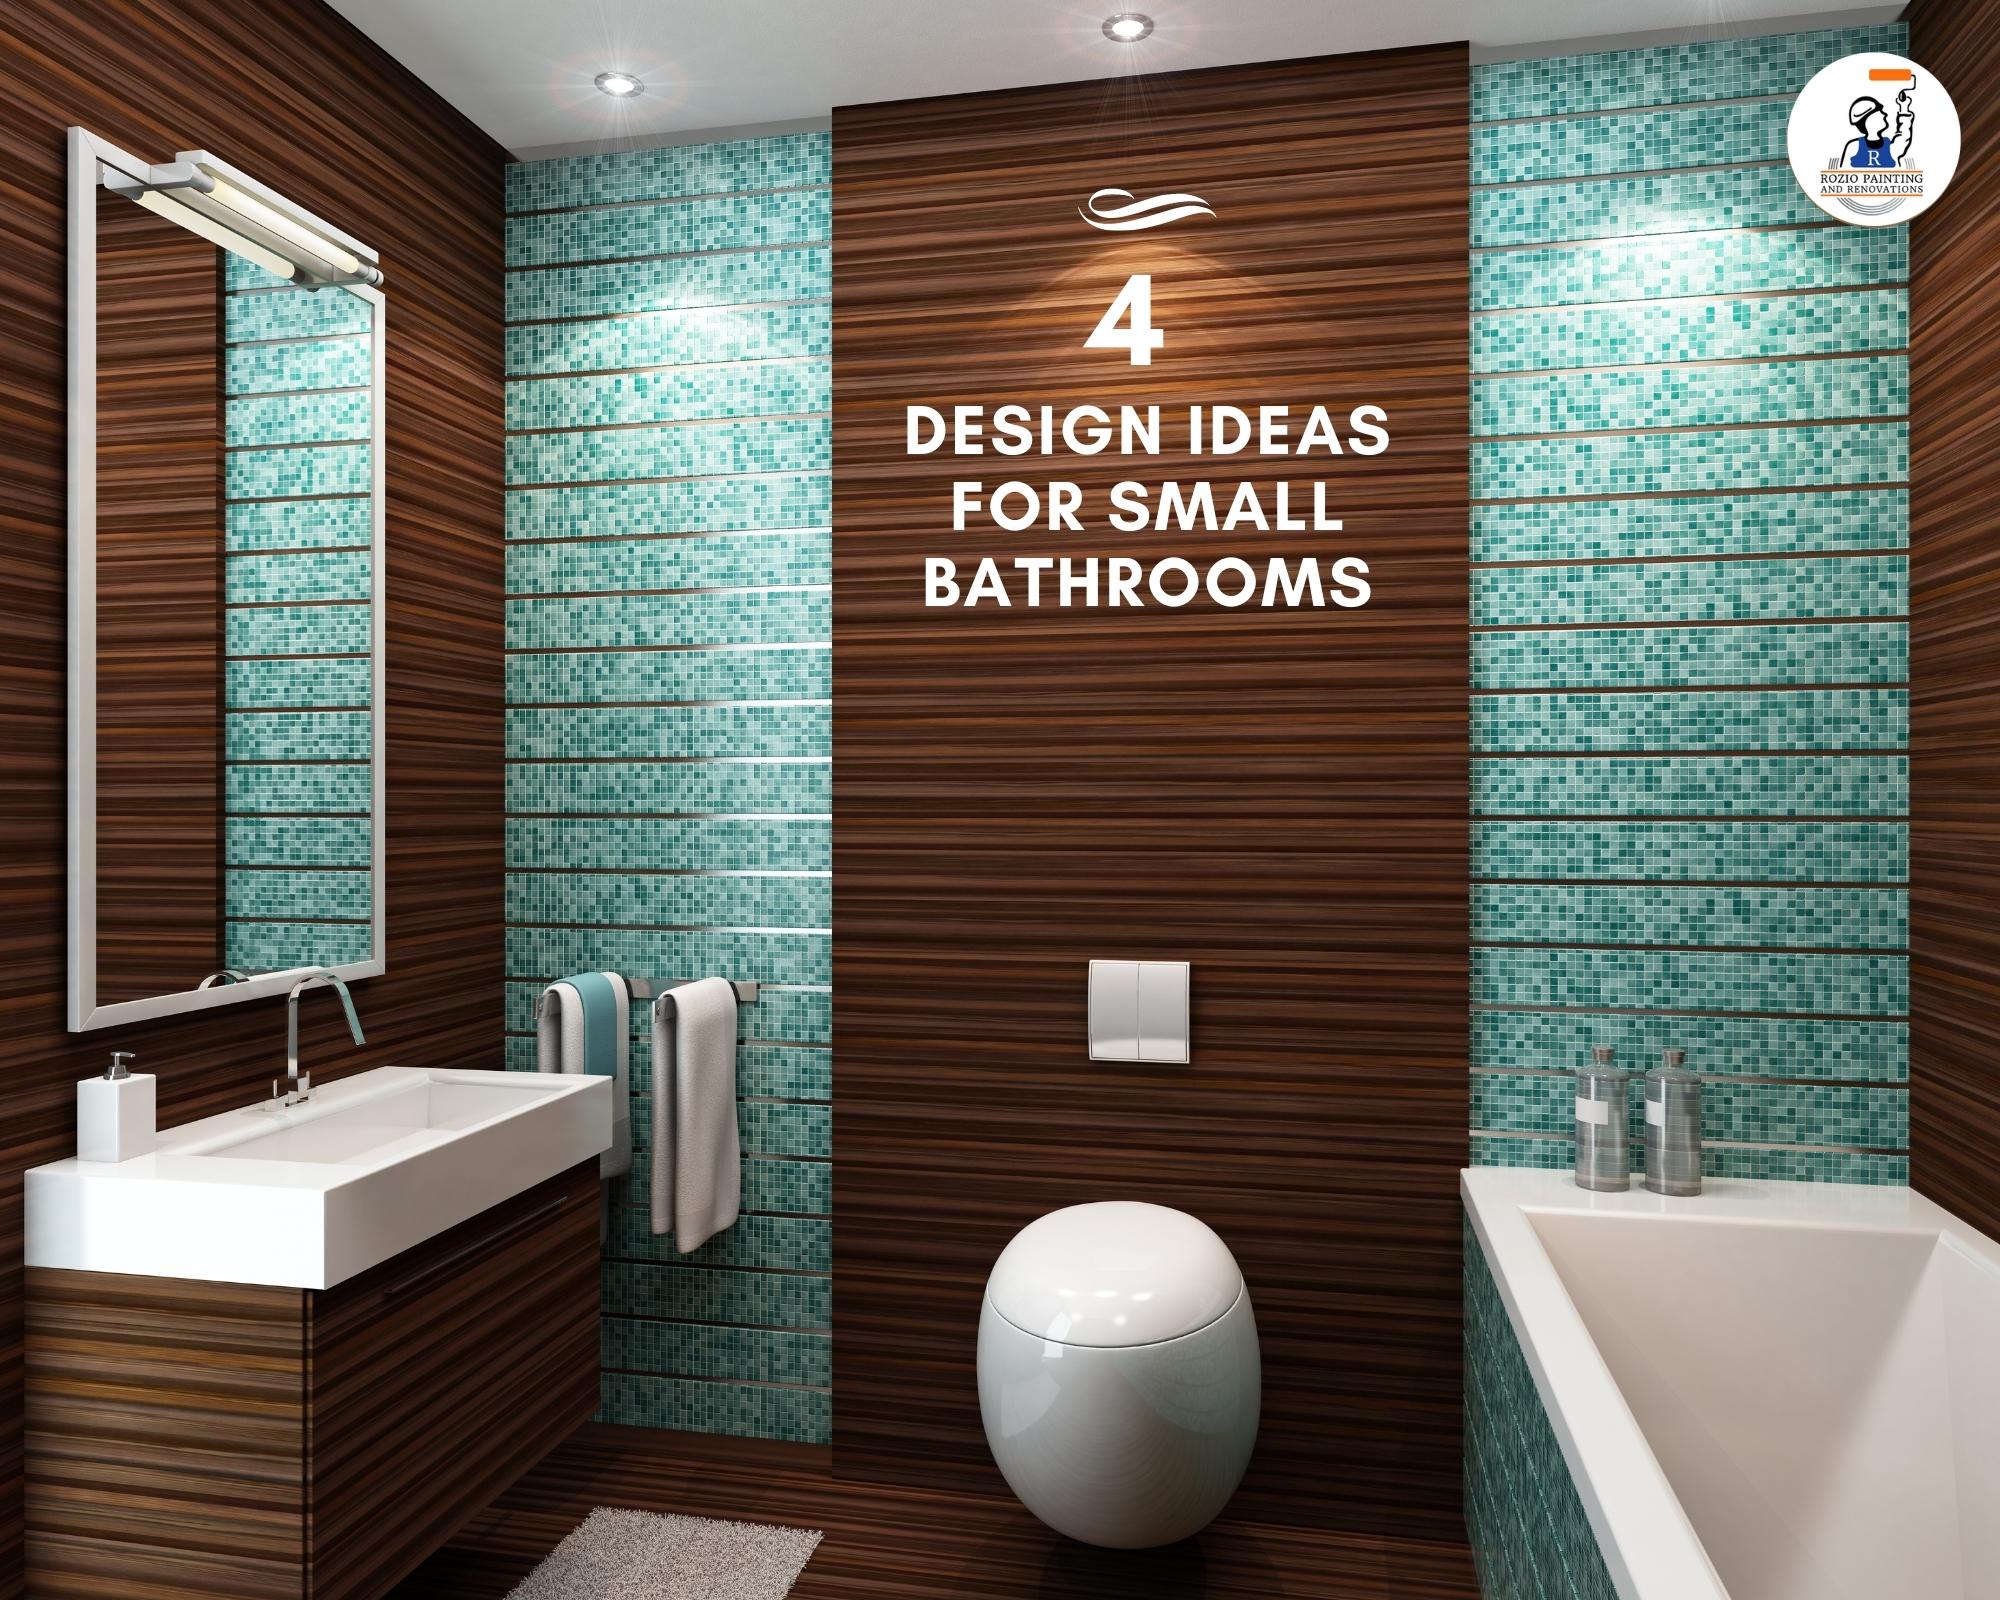 4 Design Ideas For Small Bathroom